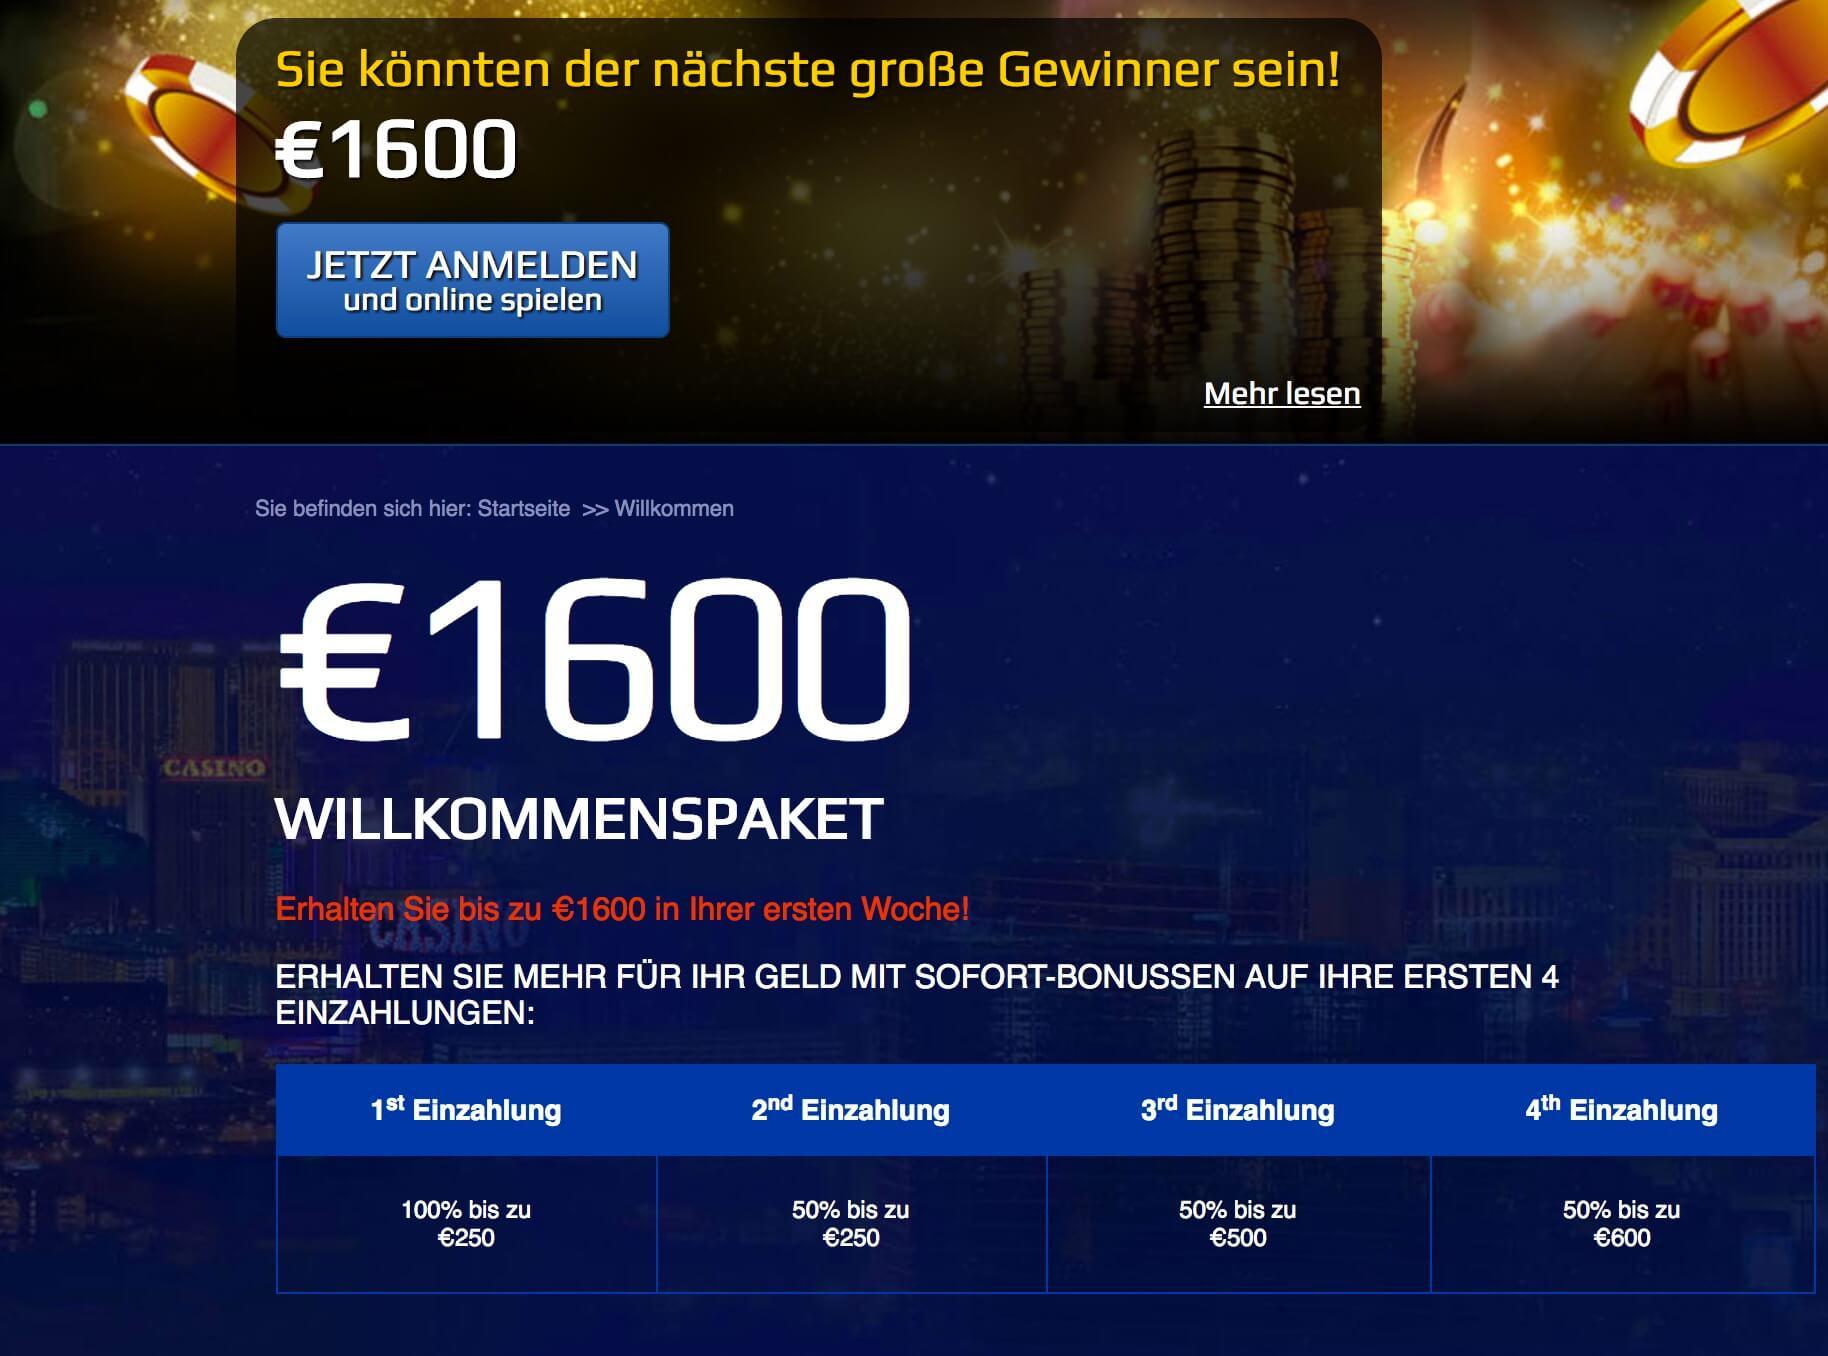 kr credit online casino in euro